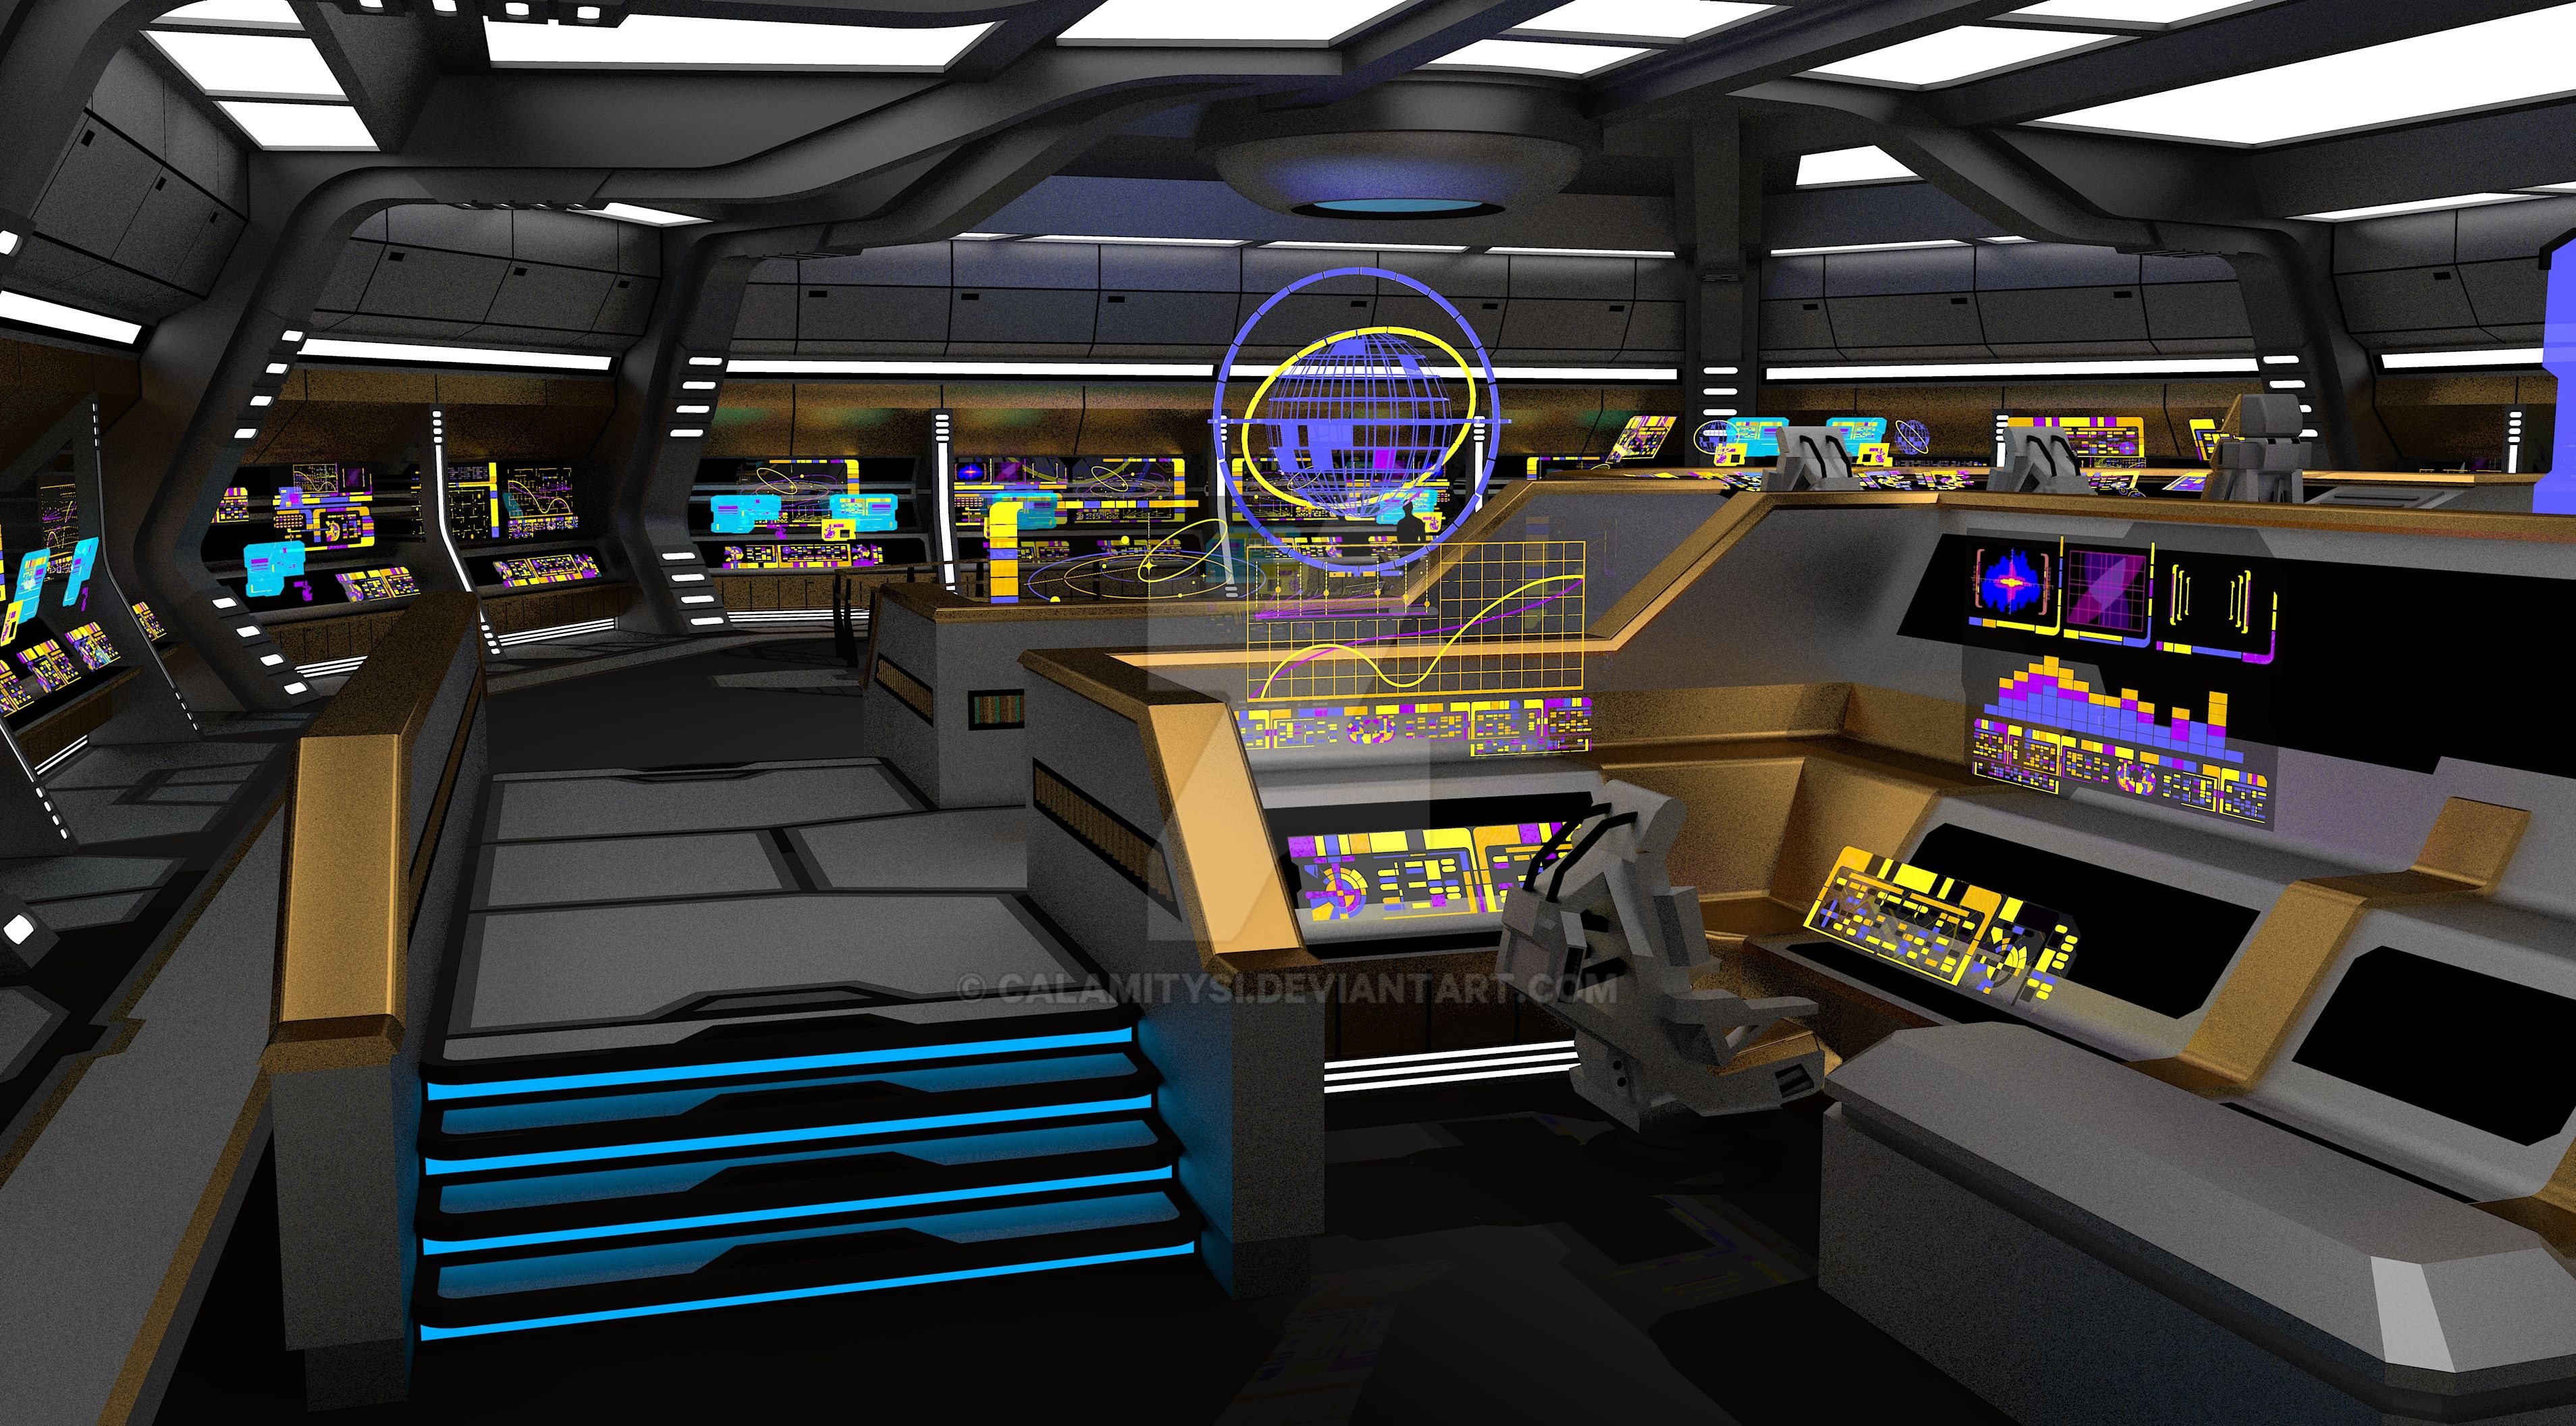 Federation Carrier Starship Uss Valkyrie Bridge 7 By